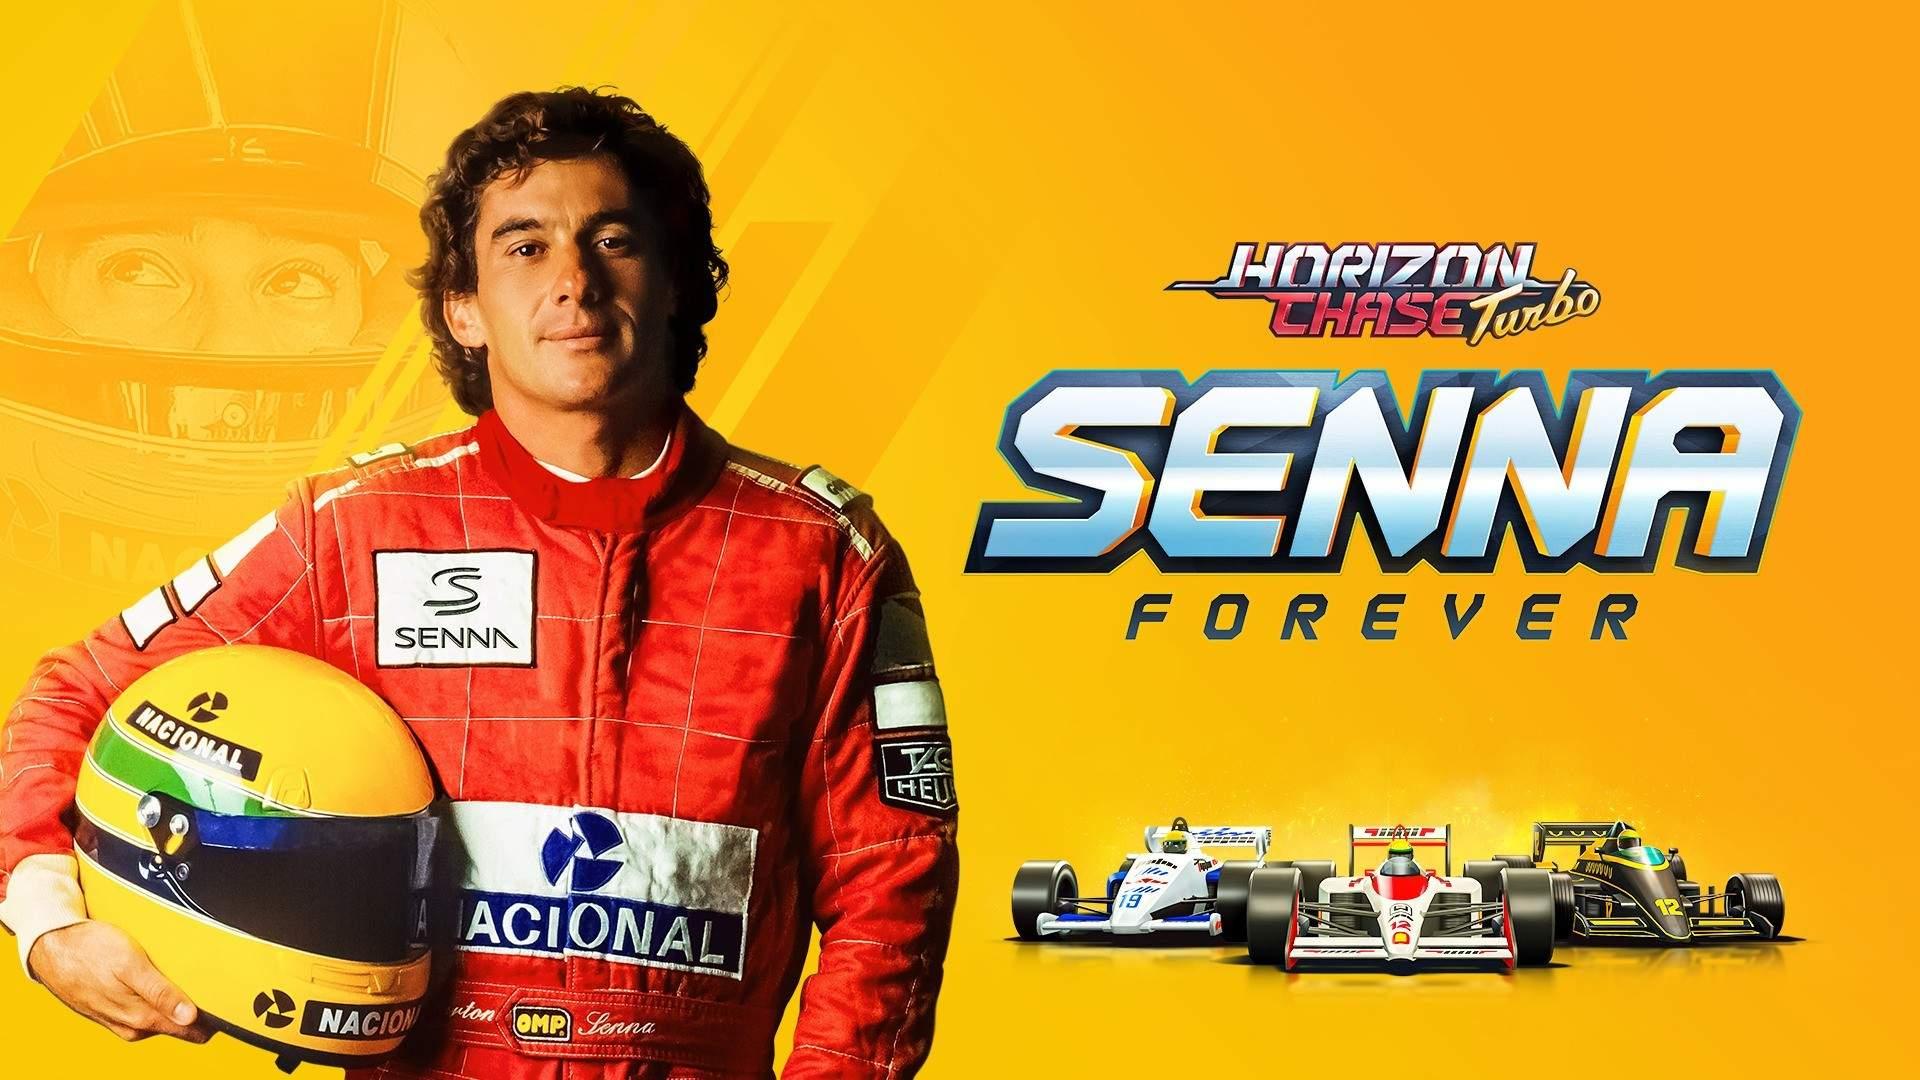 Horizon Chase Turbo - Senna Forever